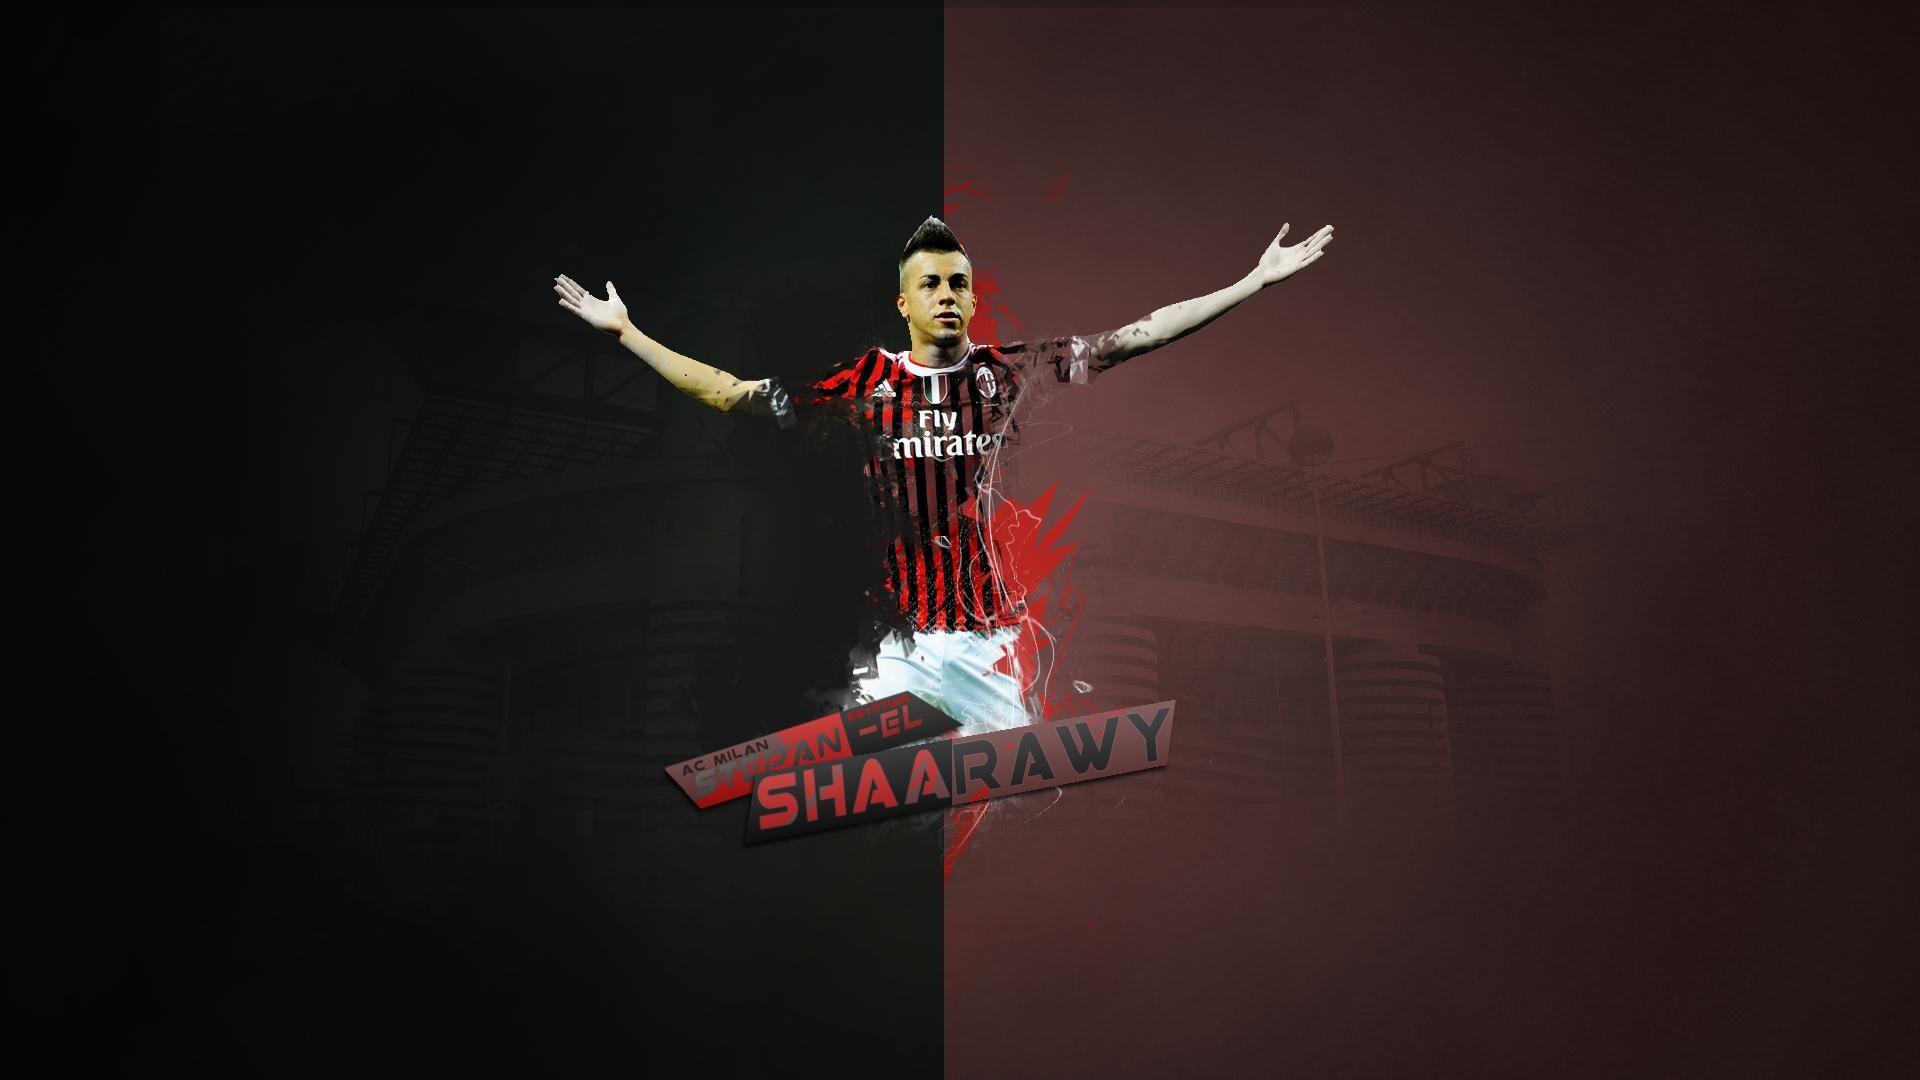 wallpaper.wiki-Ac-Milan-Stephan-El-Shaarawy-Football-